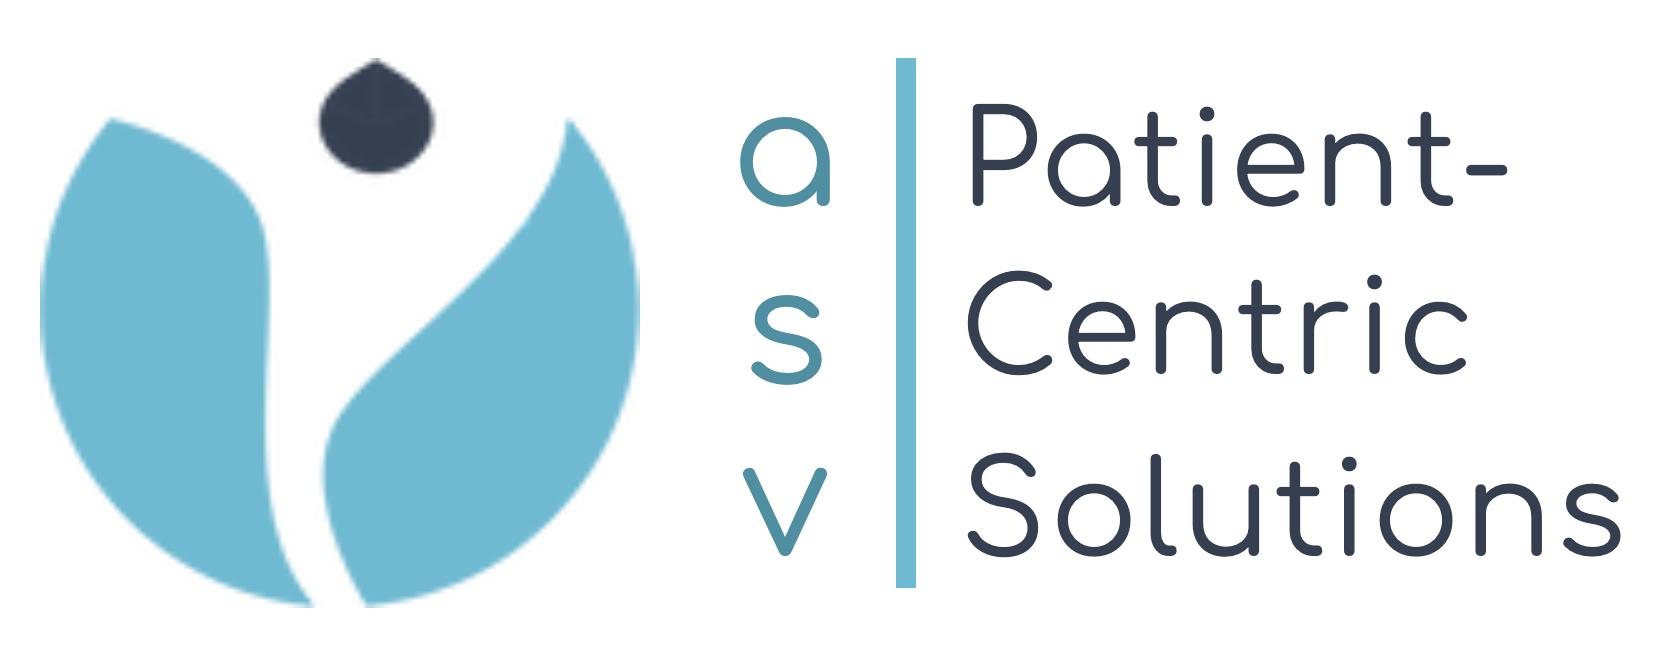 asv patientcentricsolutions